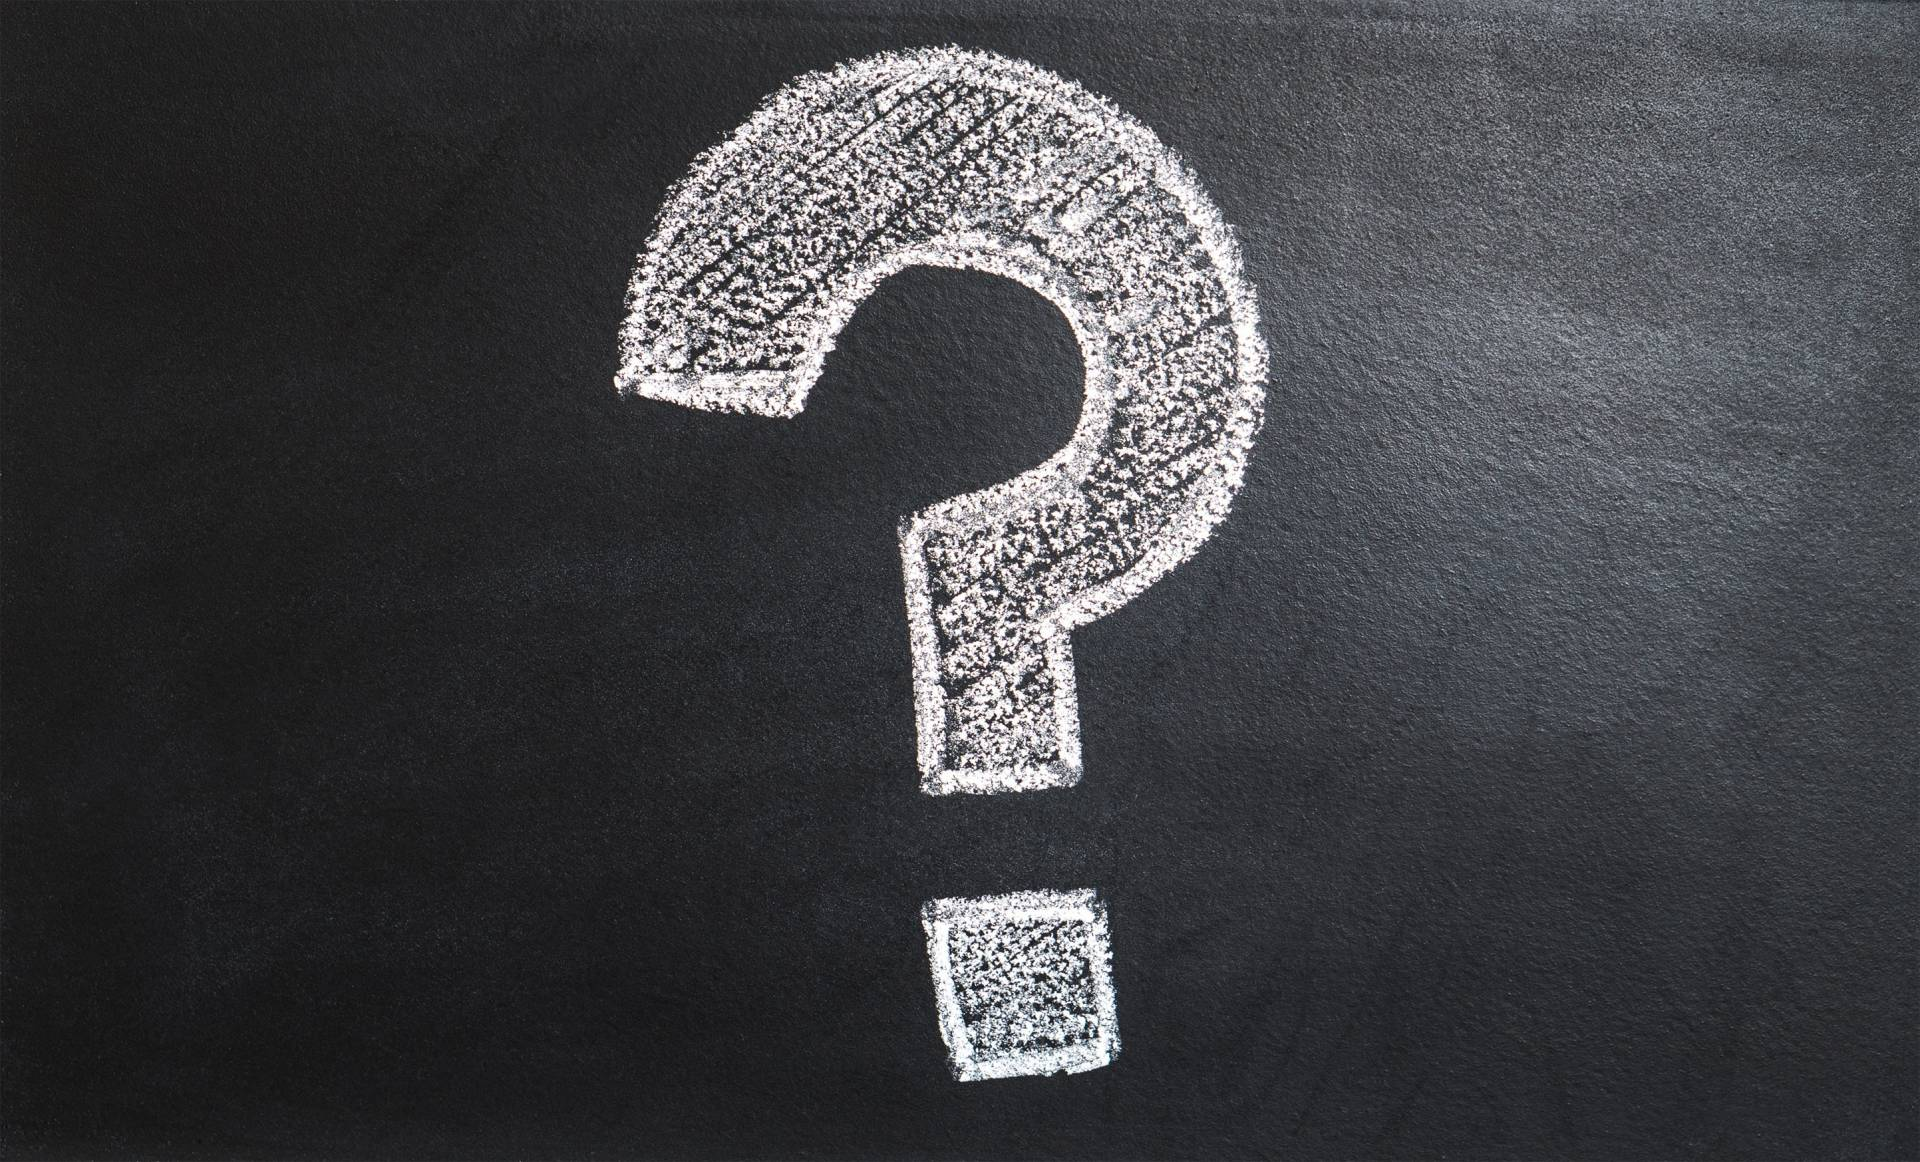 Job Offer Questions